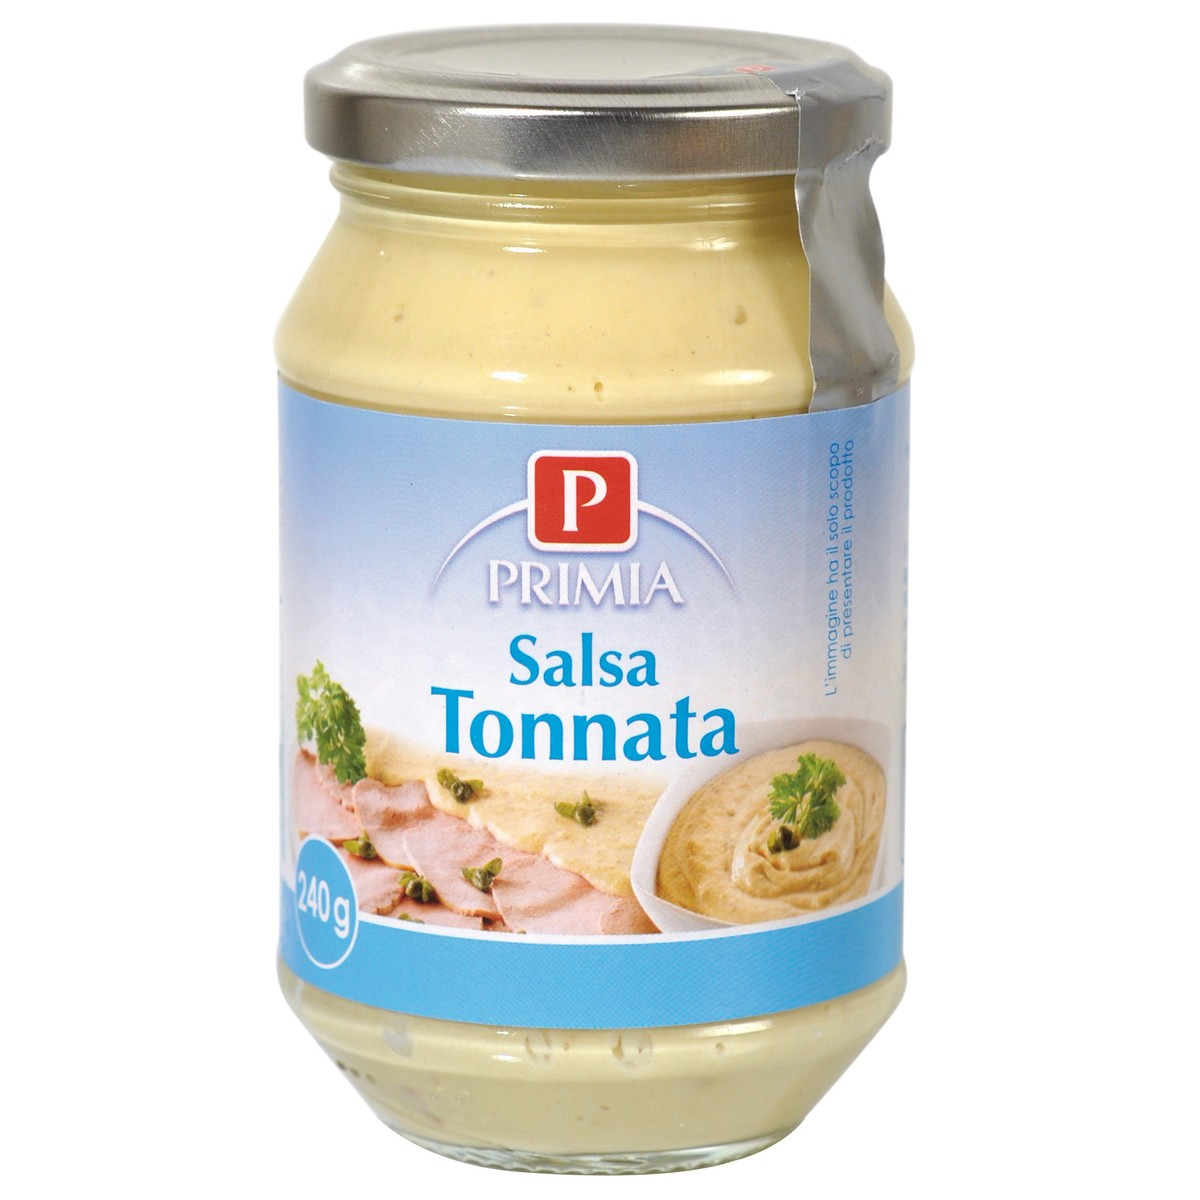 Salsa Tonnata